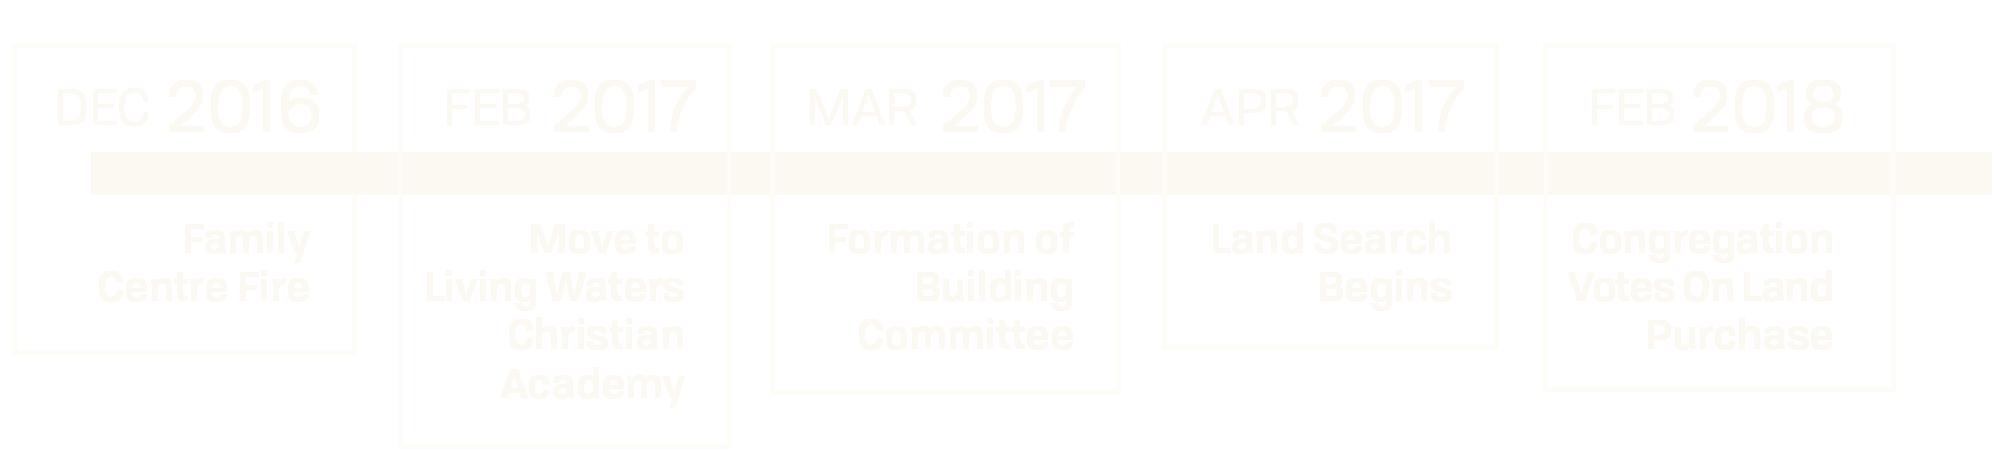 SPAC Flourish Timeline